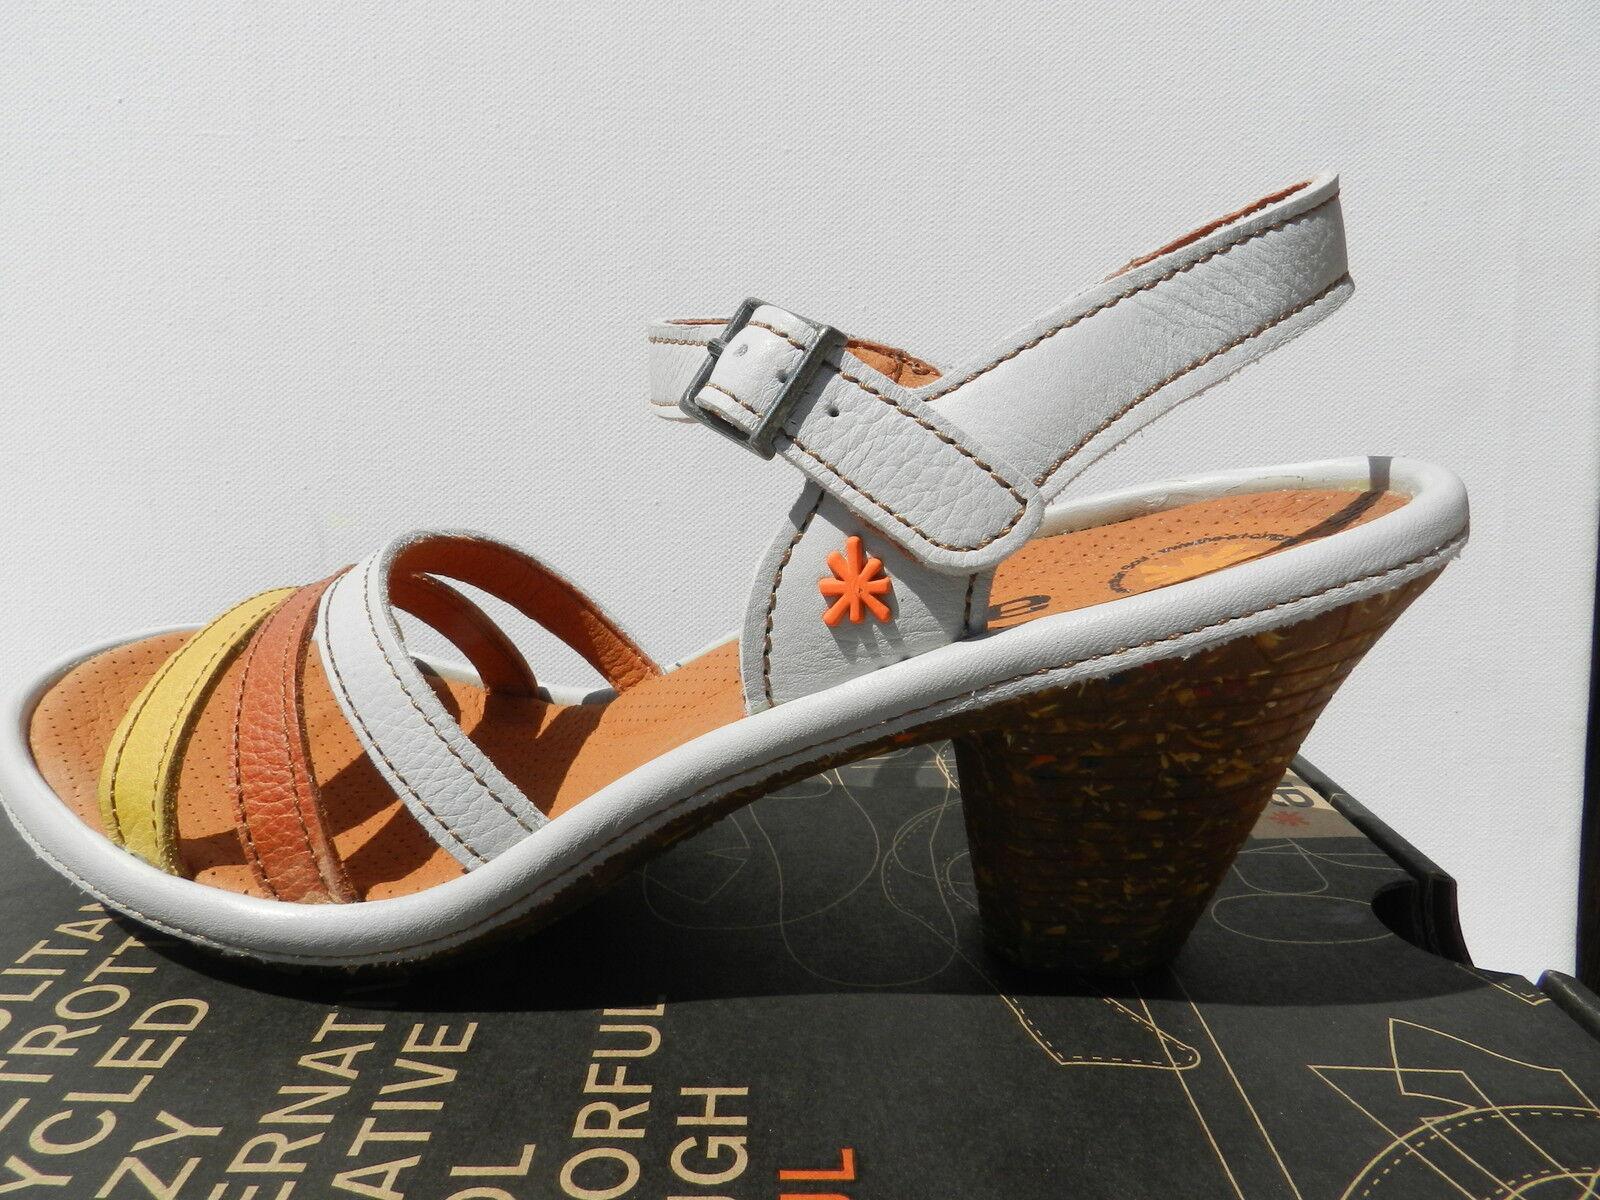 Art st honore kvinnor 41 sandaler 0764 764 pumpar ballerinor ballerinor ballerinor uk8  omtänksam service